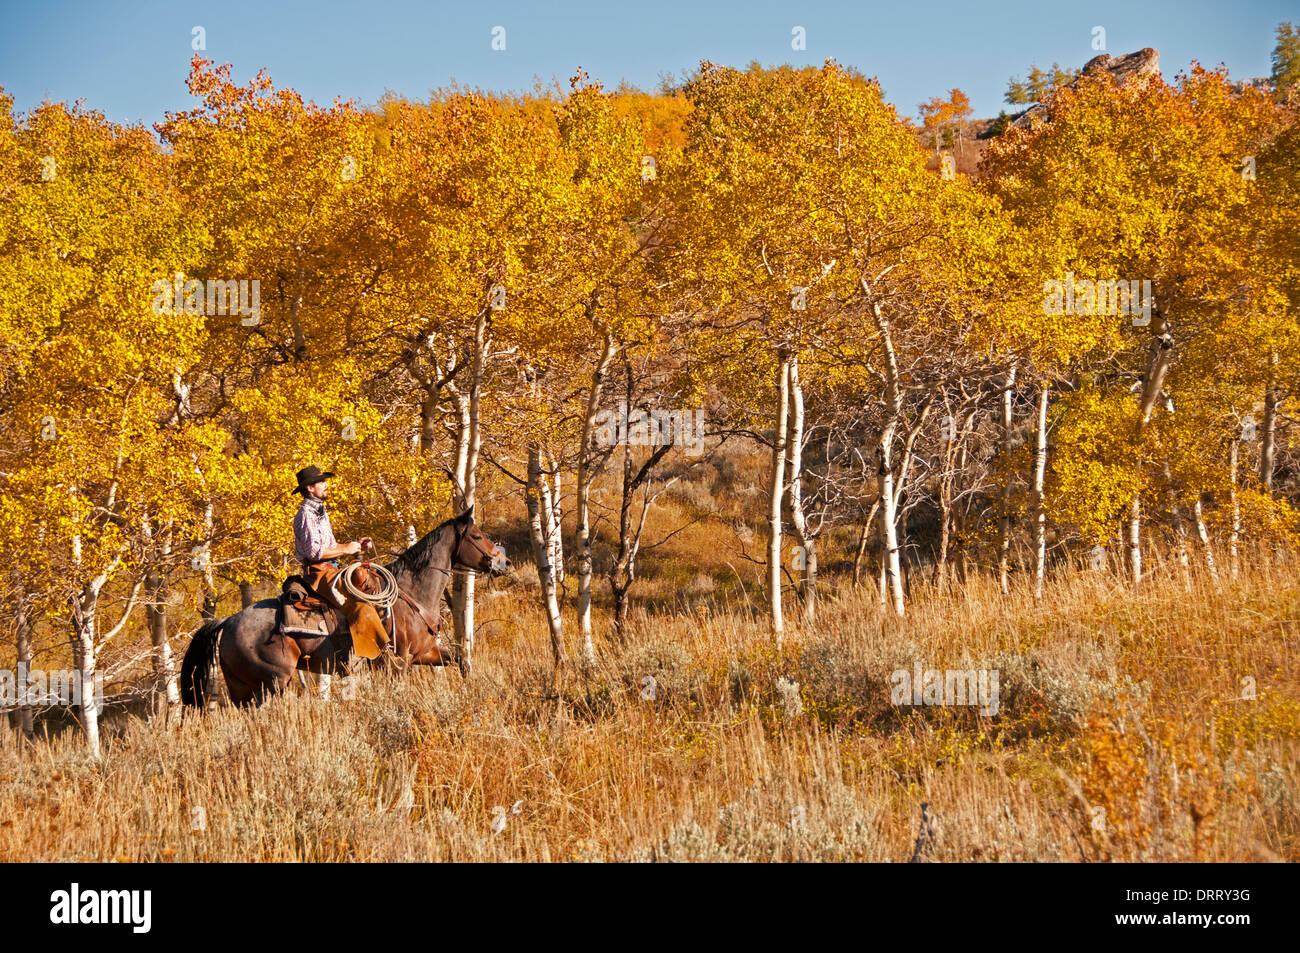 Cowboy on horseback near Aspen trees, Bighorn National Forest, Wyoming Stock Photo